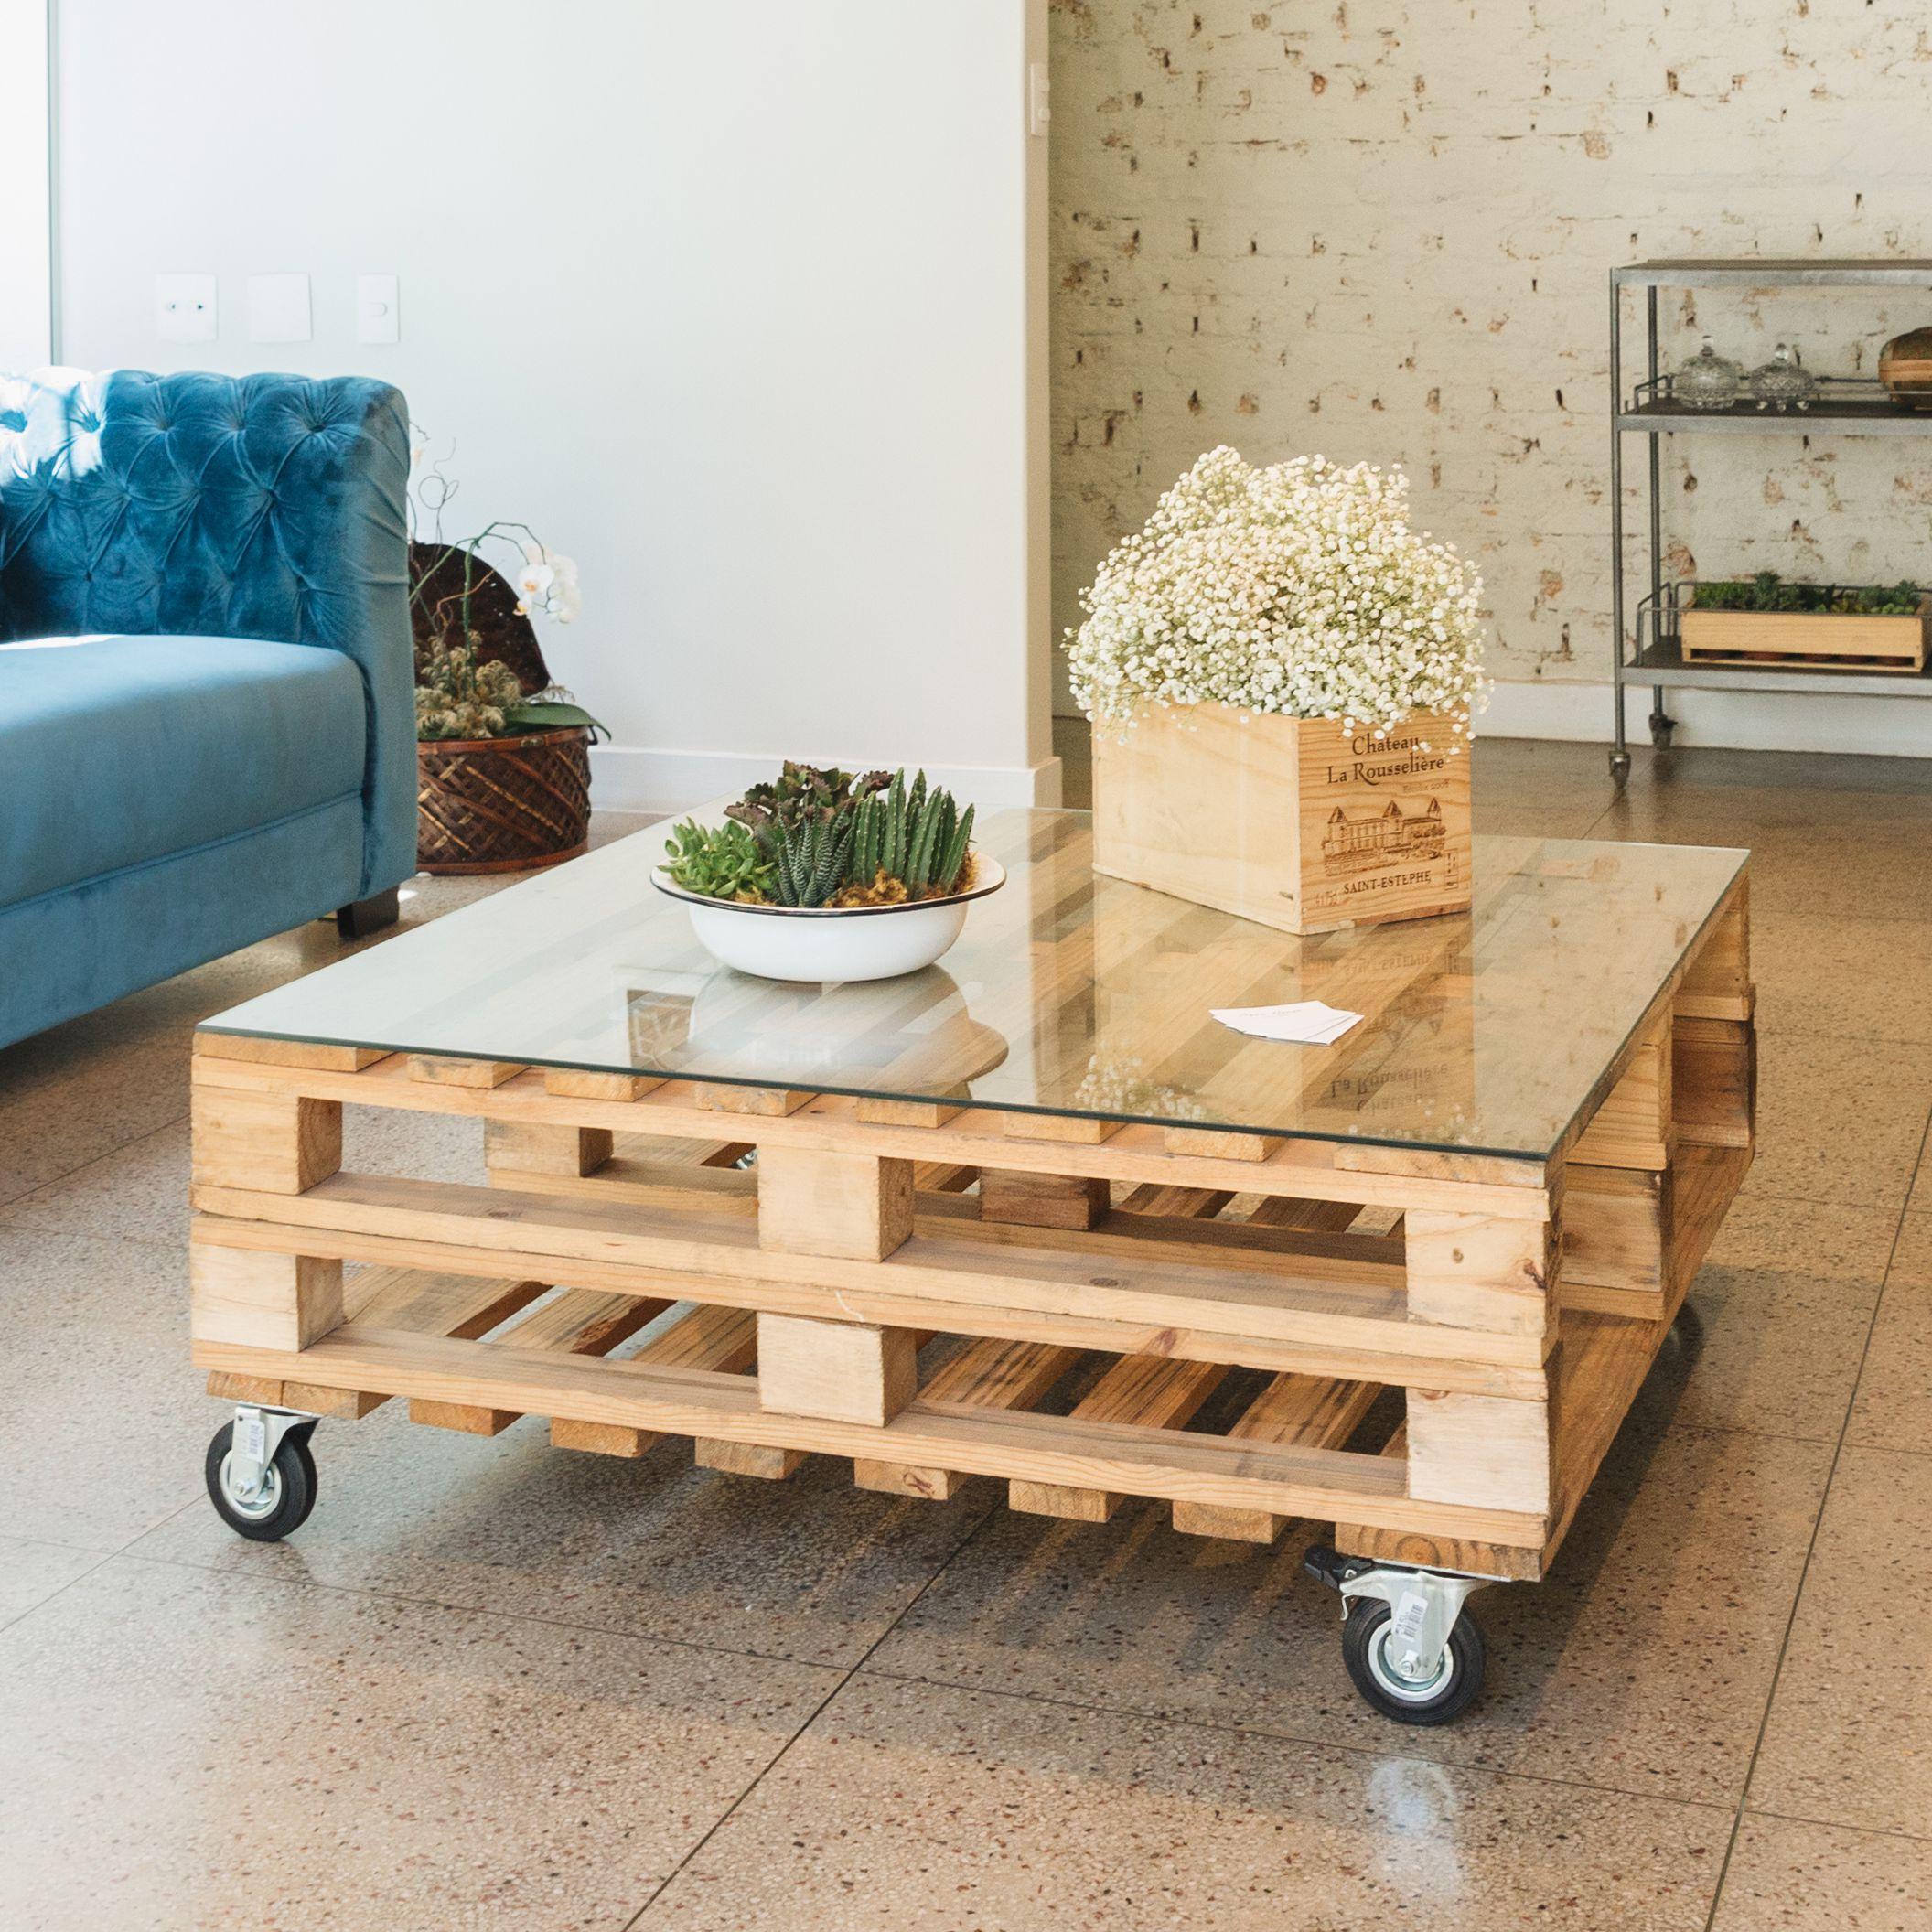 20 Free Pallet Furniture Plans